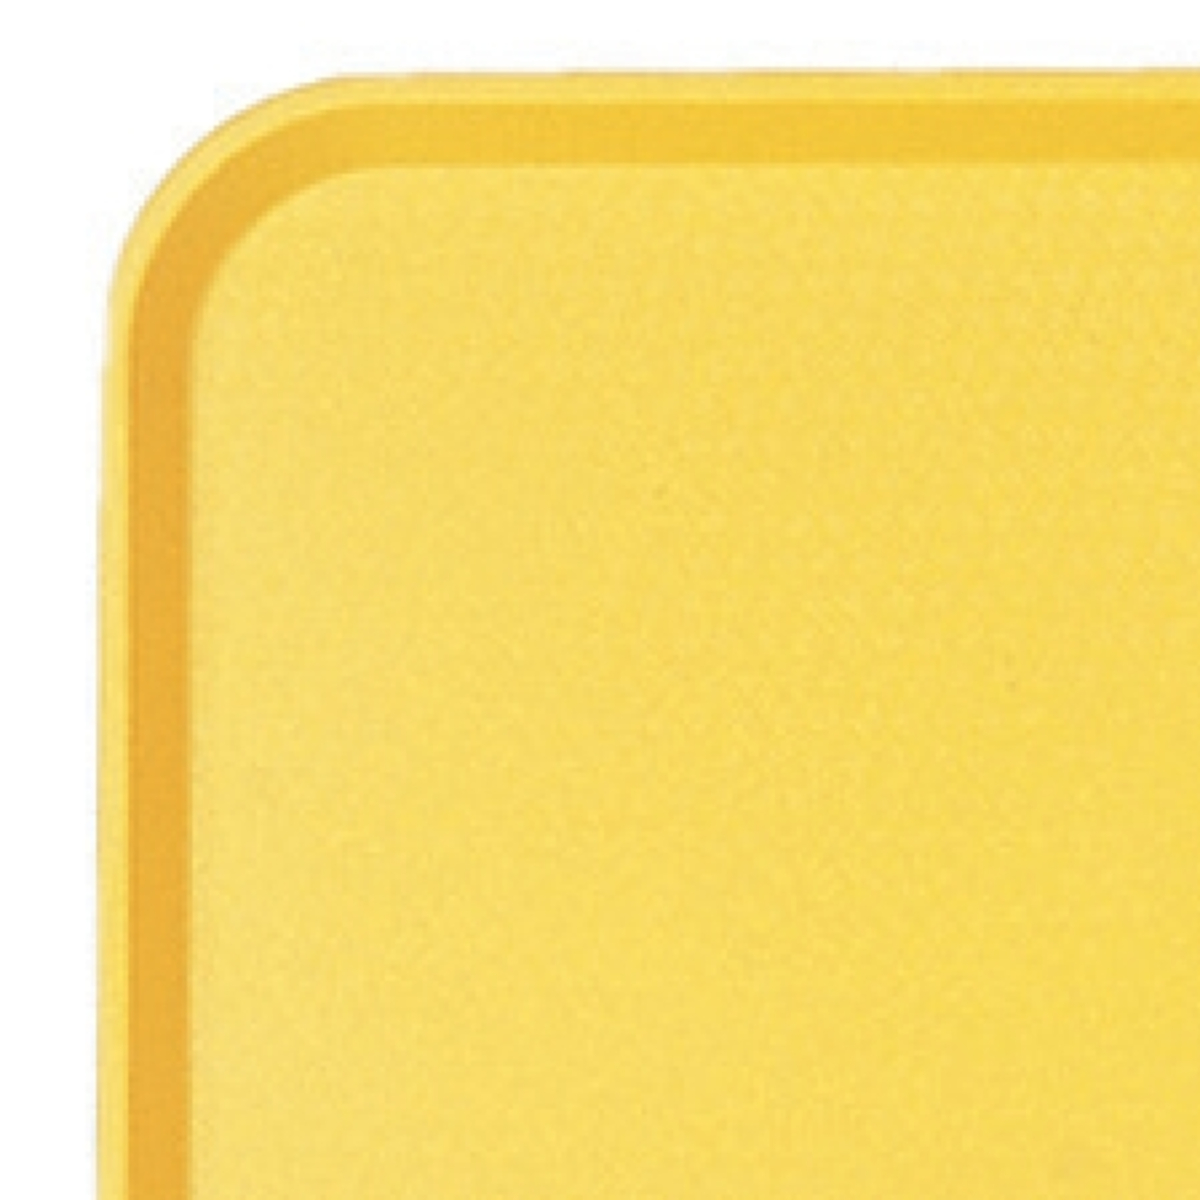 Plateau jaune plastique bord droit Fast Food Cambro